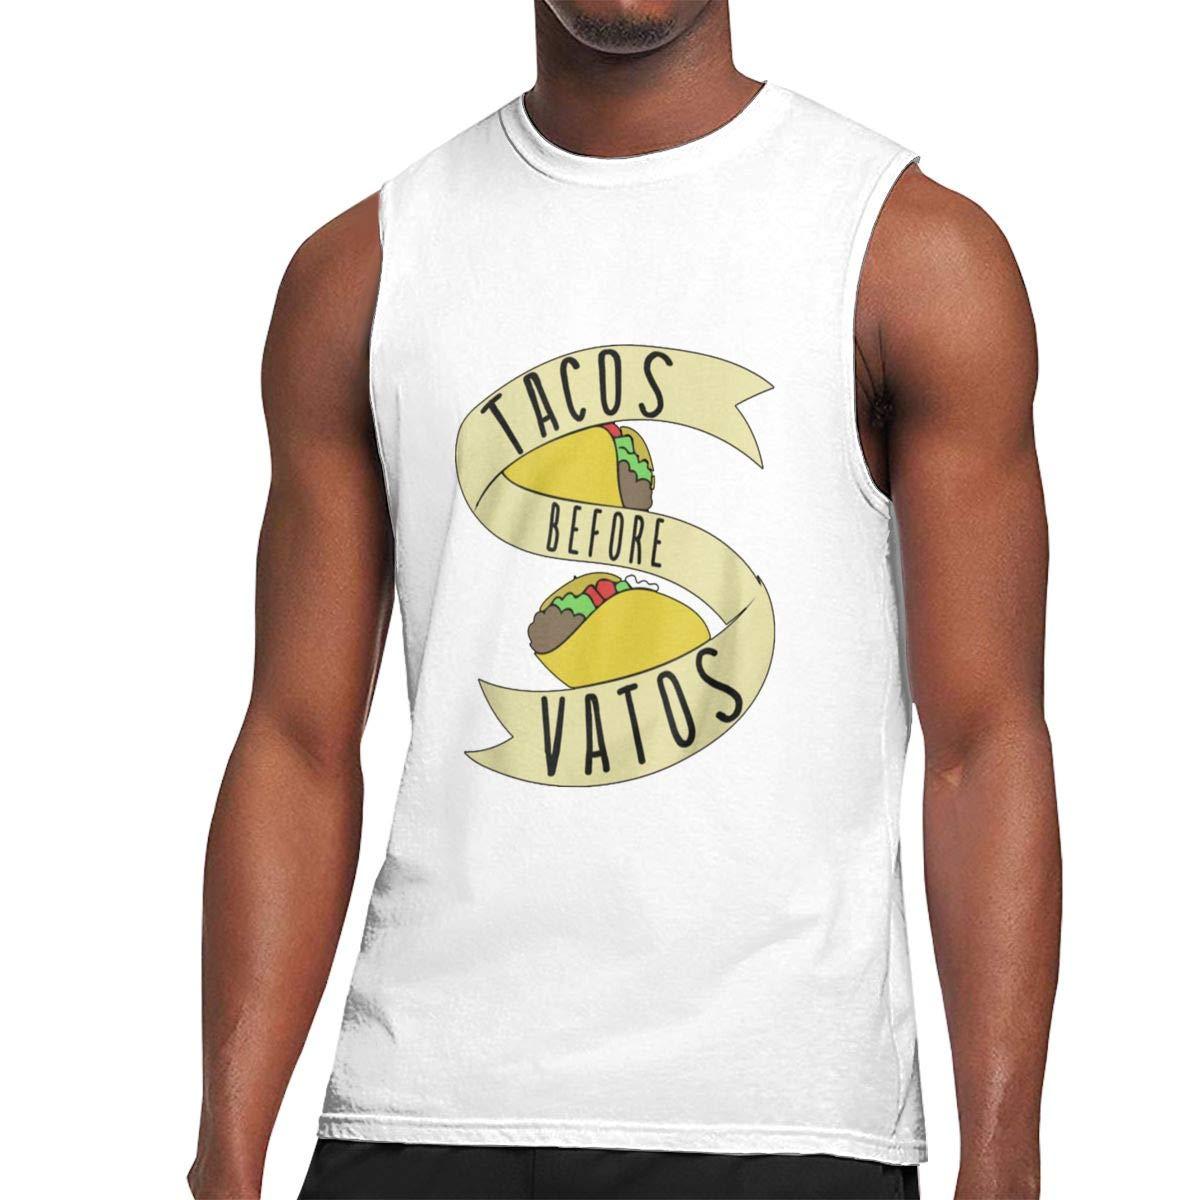 Seuriamin Tacos Before Vatos Humor Gym Sleeveless Muscle Short Sleeve T Shirts